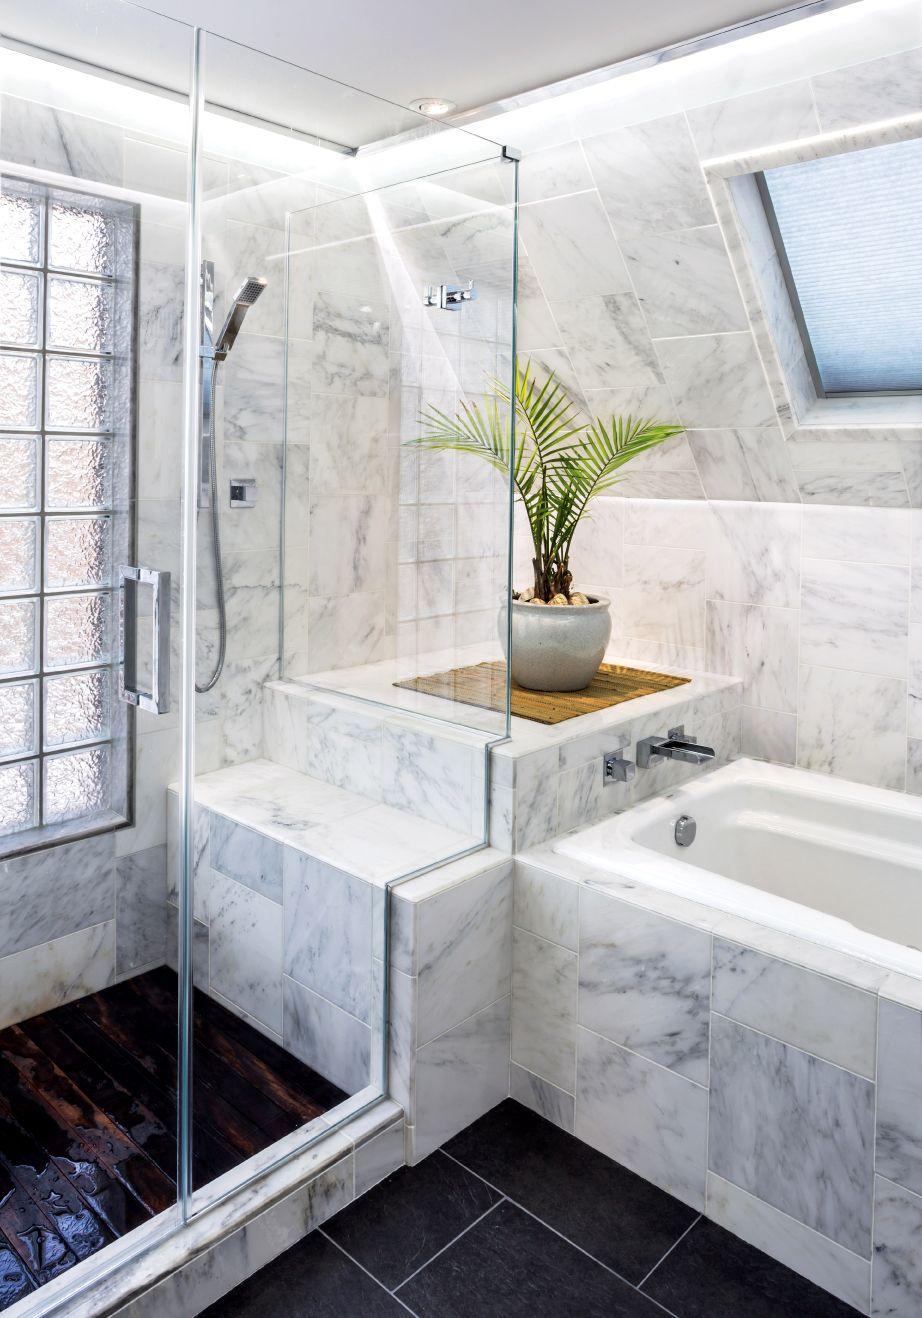 glass block windows bathroom - Google Search | Chestertown ideas ...